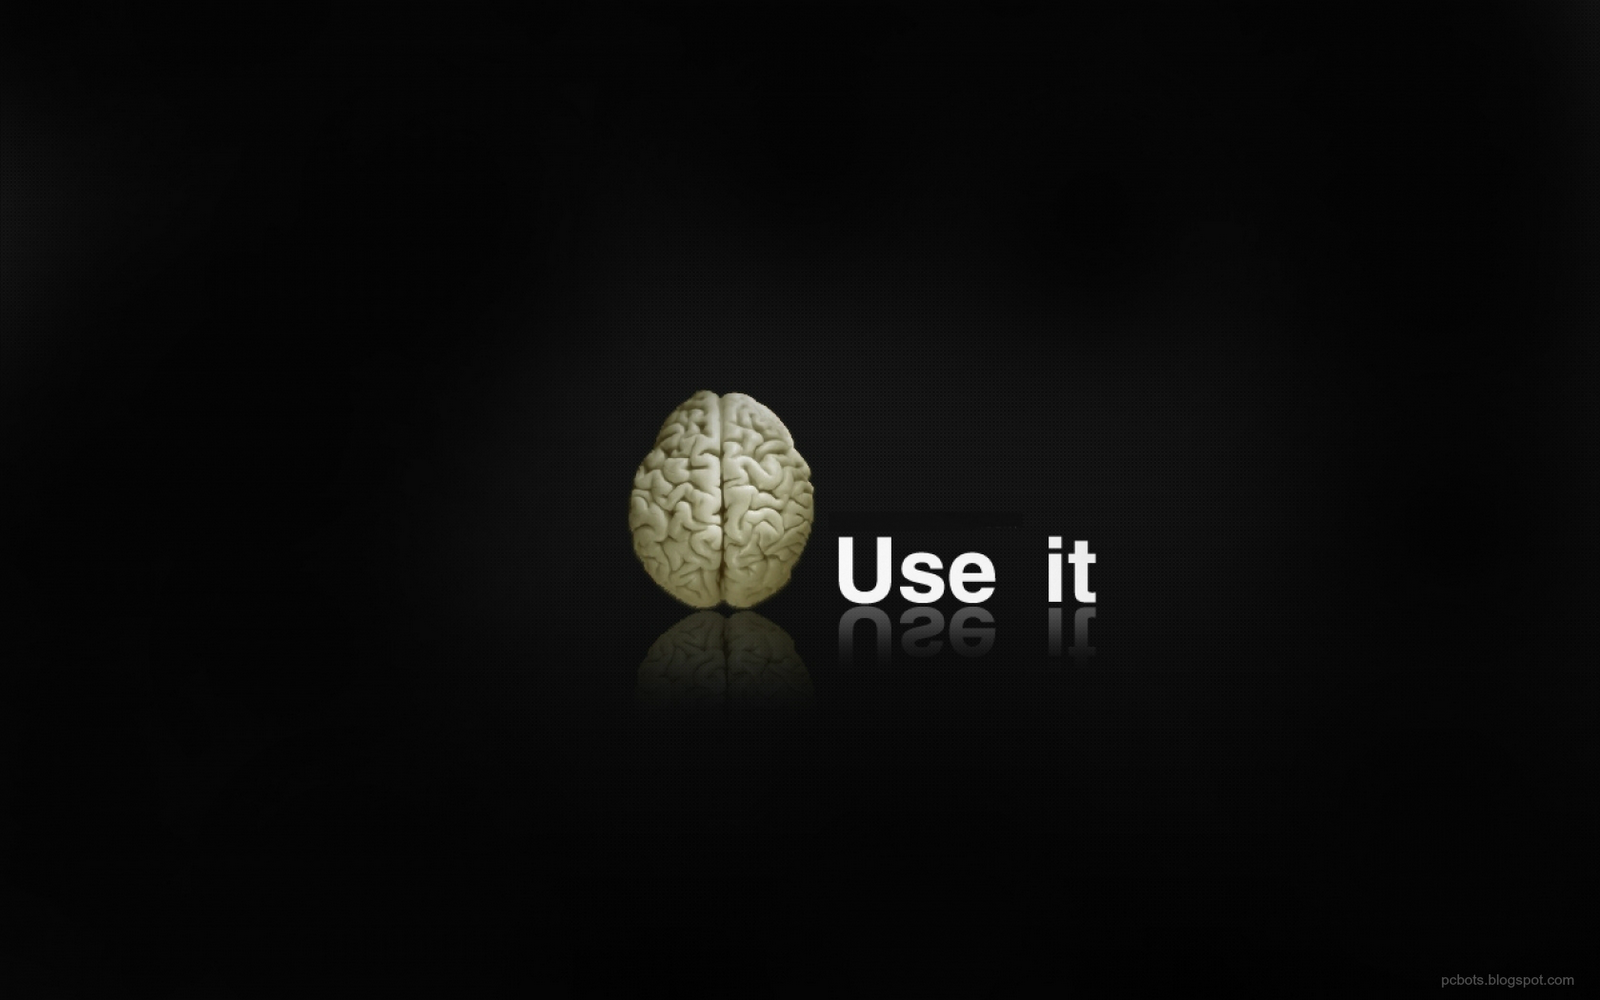 usb brain jack wallpaper - photo #12